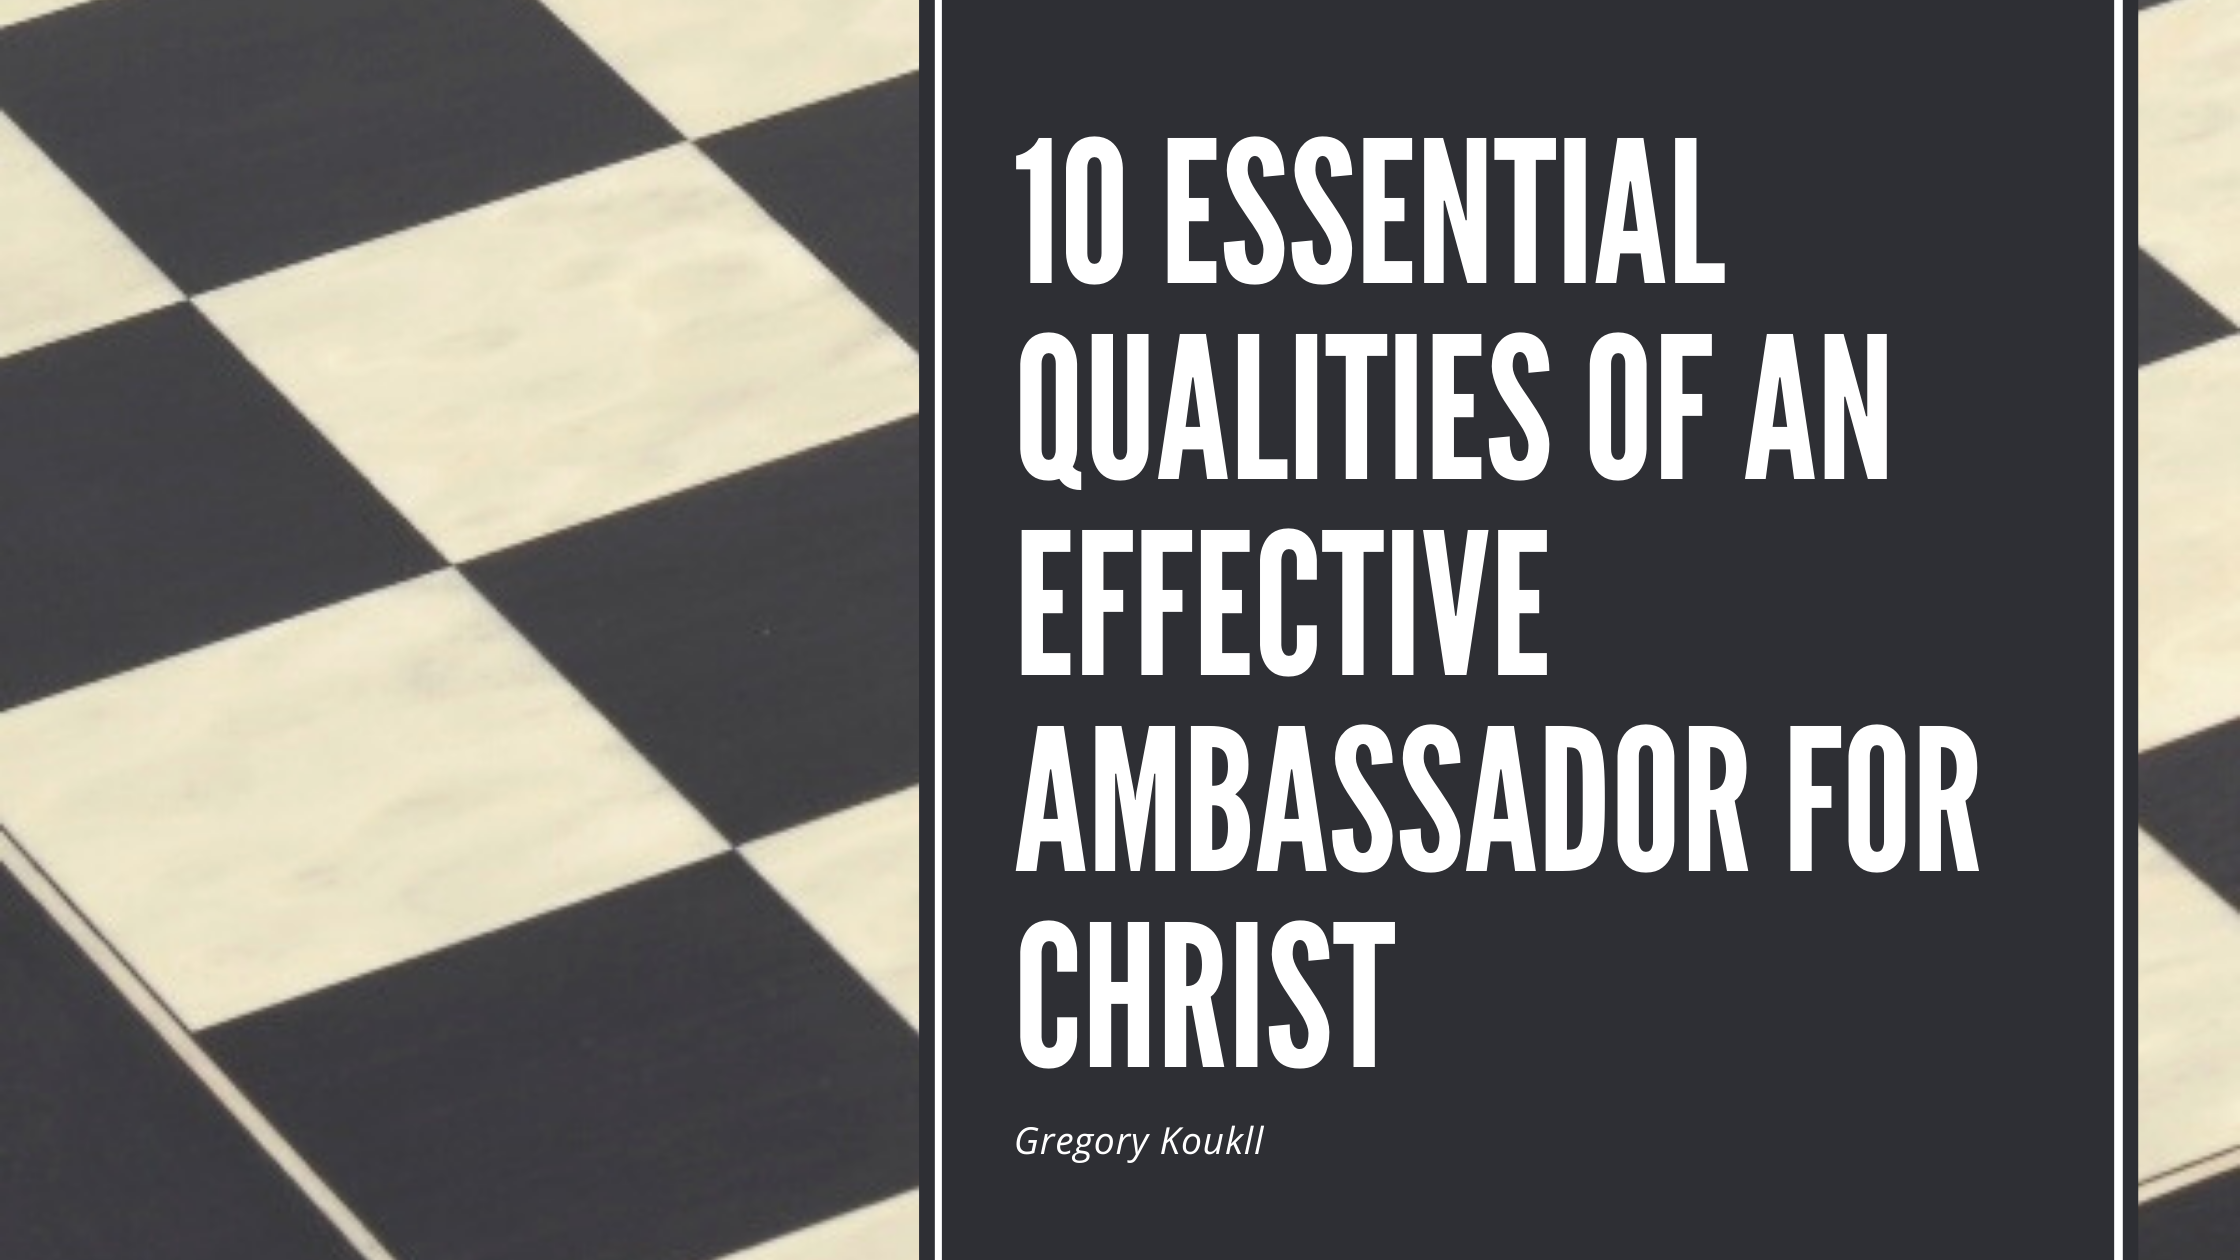 10 Essential Qualities of an Effective Ambassador for Christ